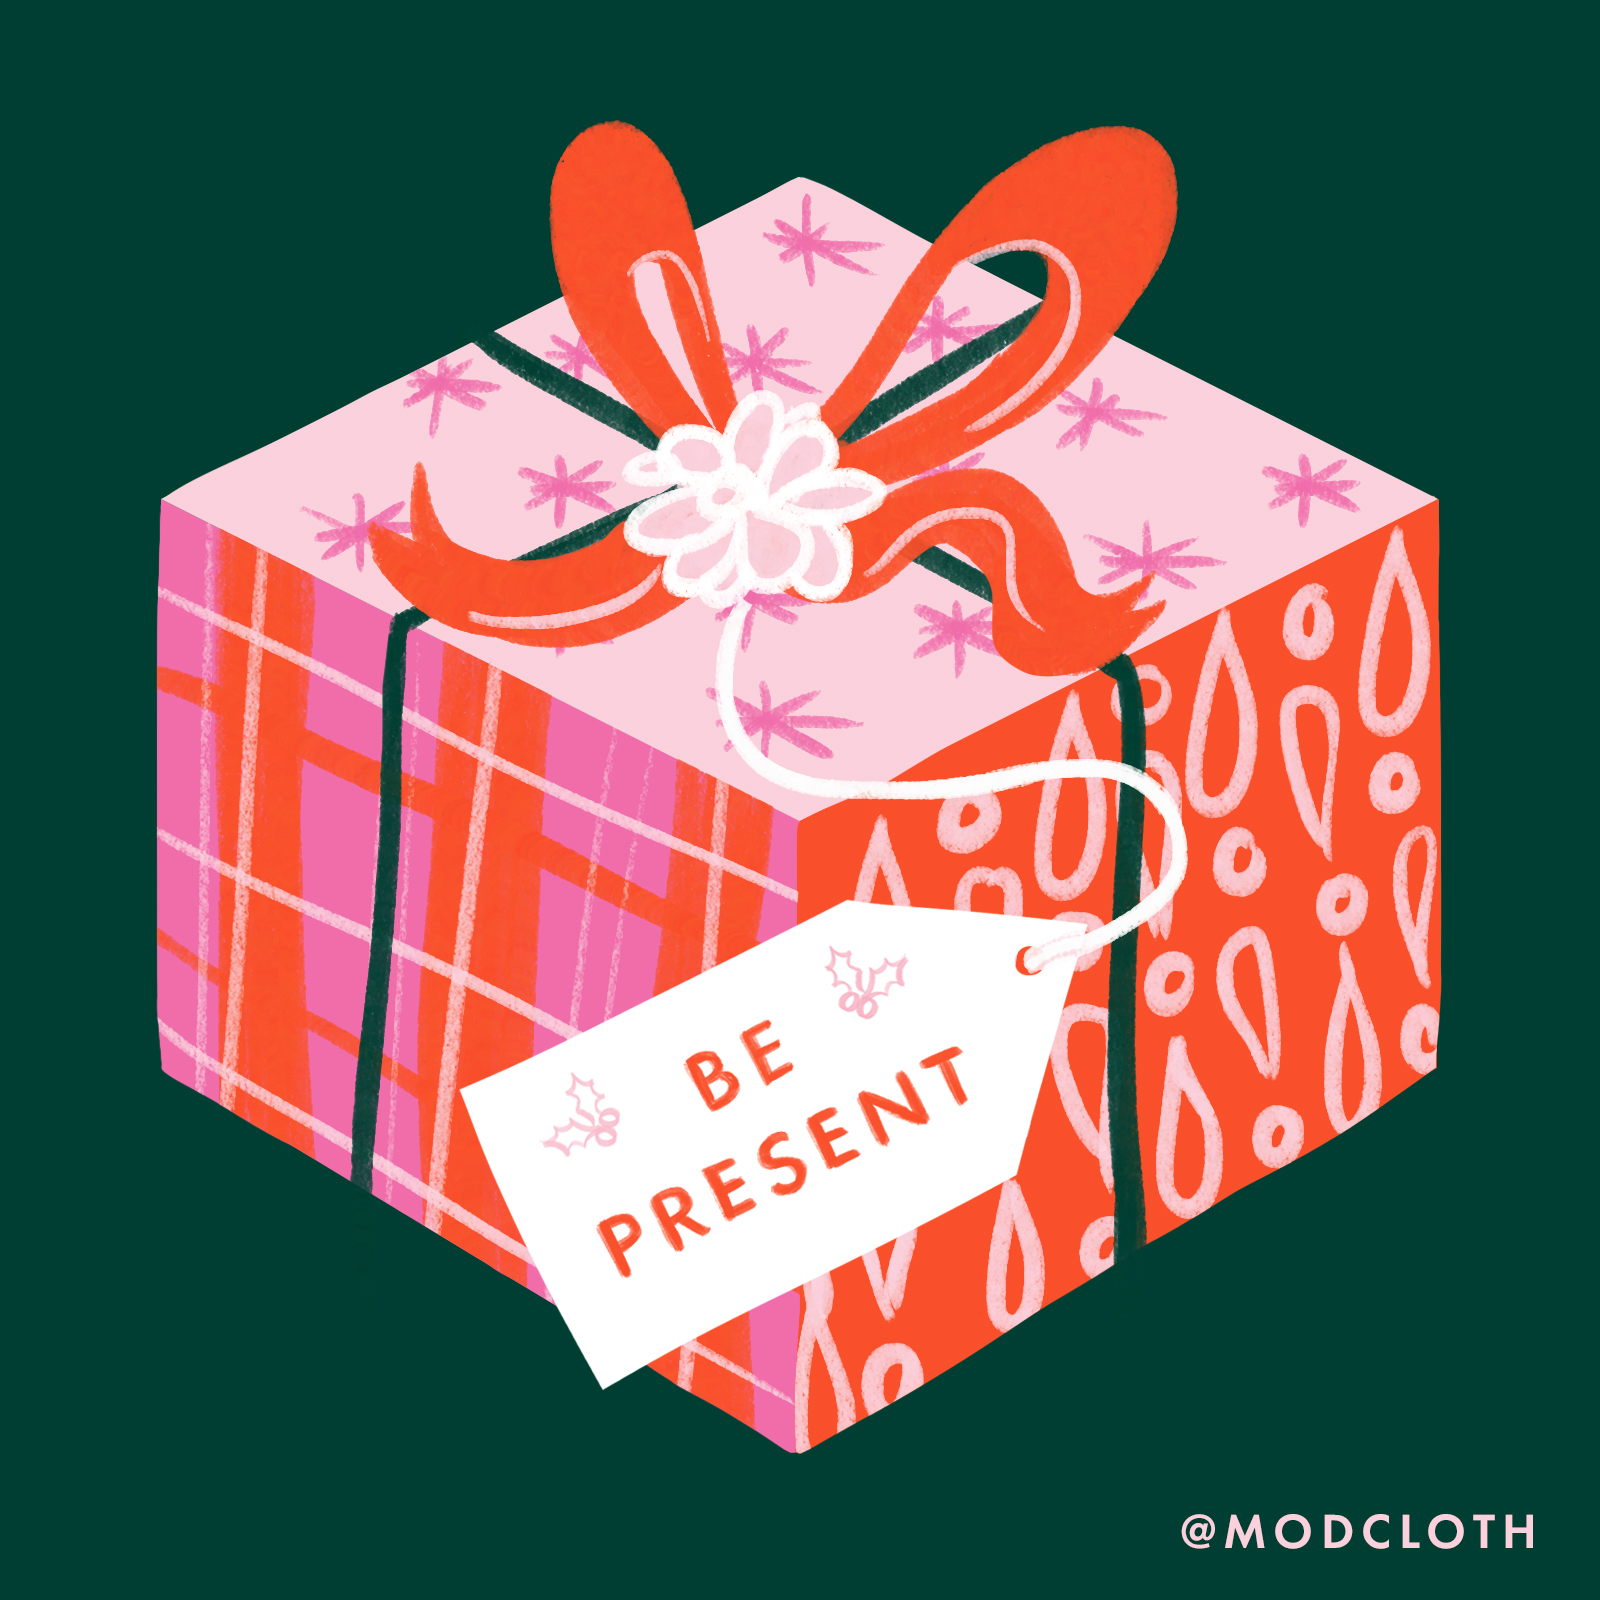 ModCloth-Social-6.jpg